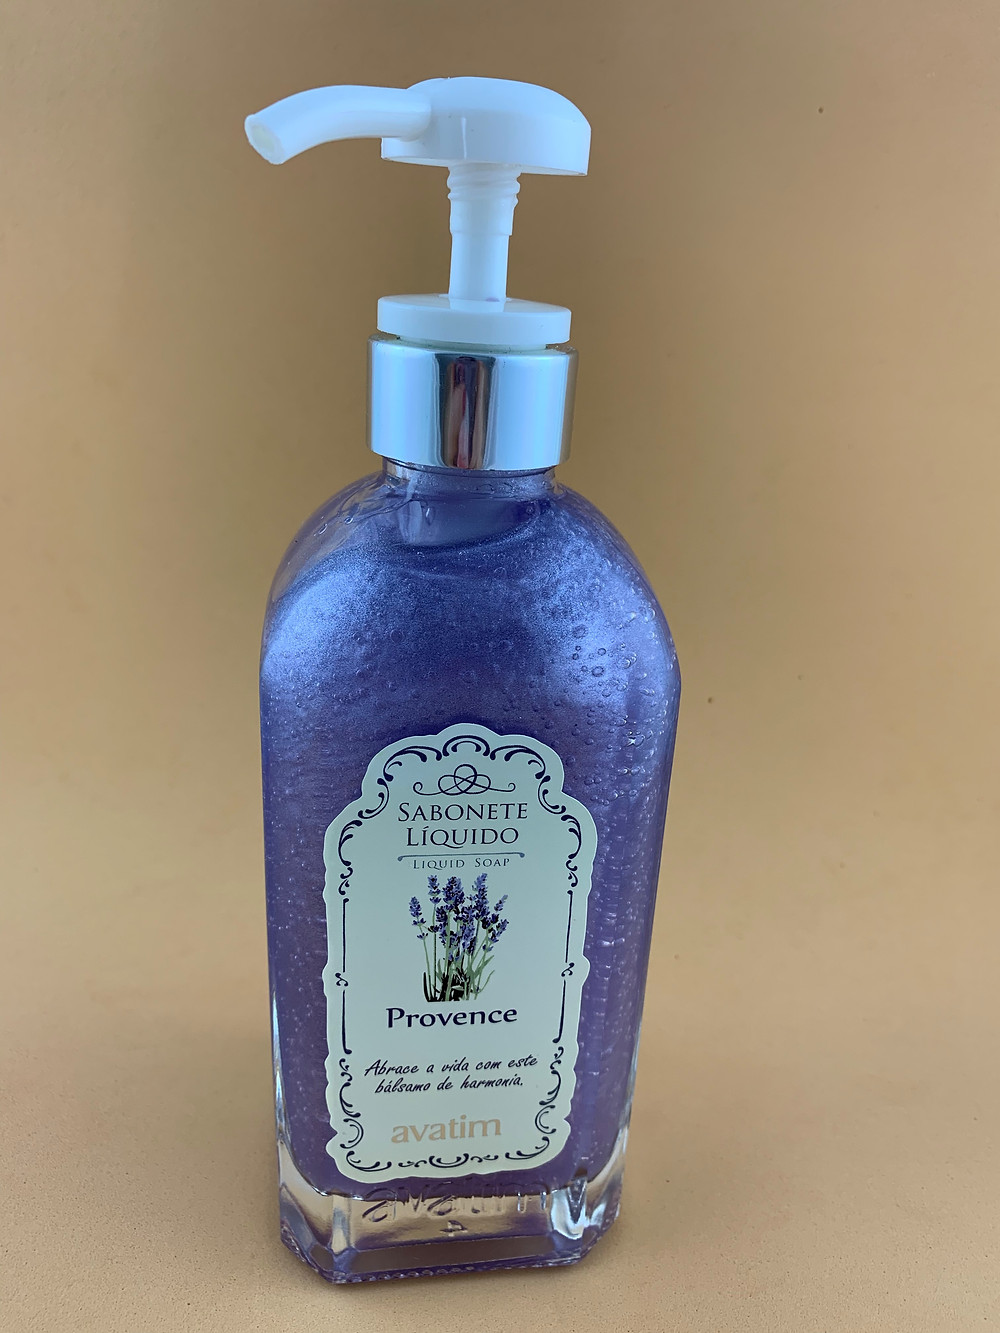 Sabonete líquido Provence Avatim